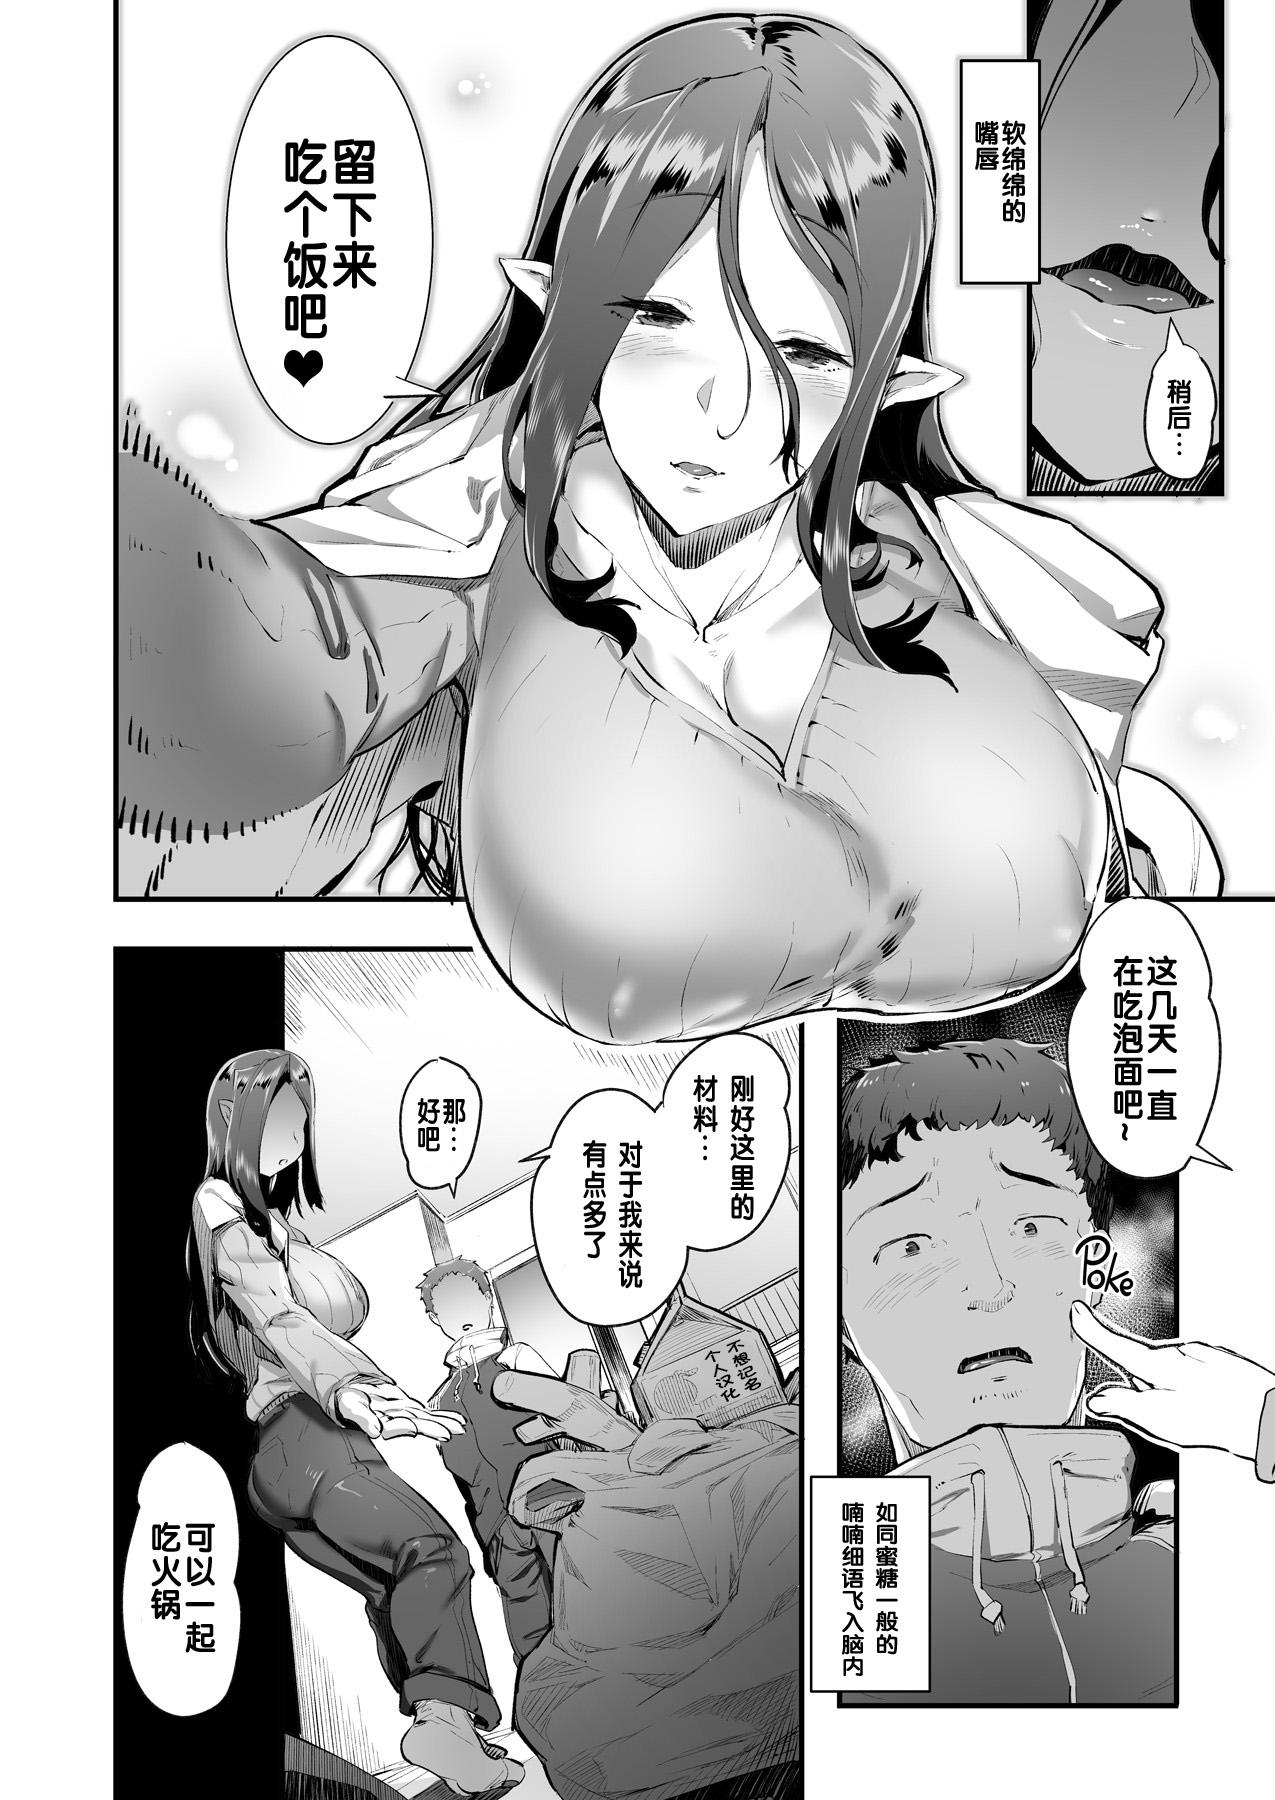 Succubus Miboujin Hirusagari no Himitsu 5